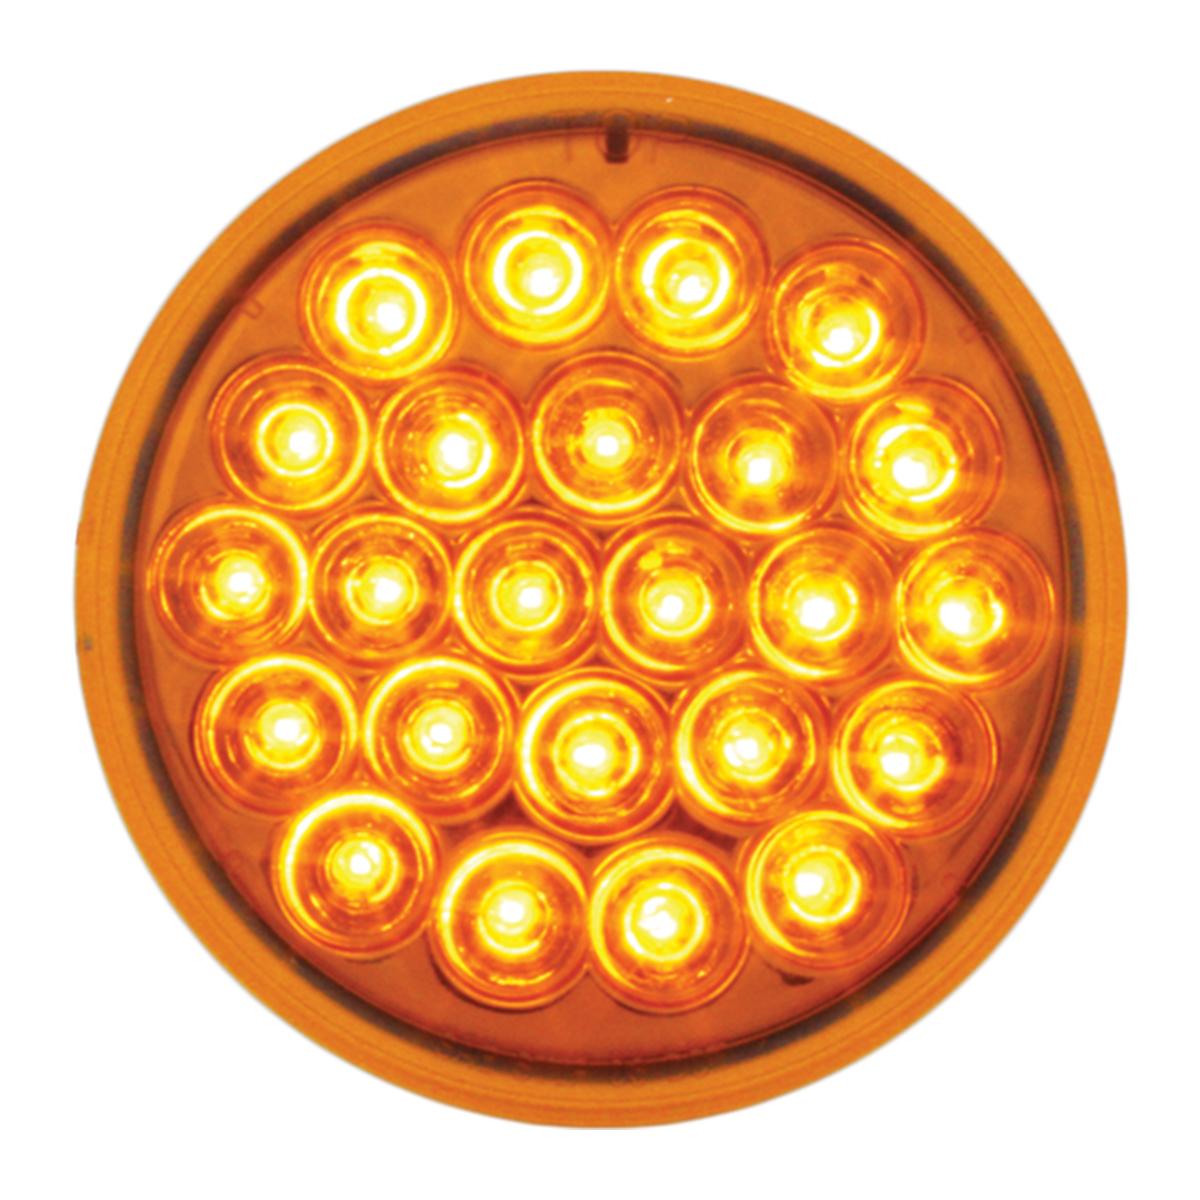 "#78270 4"" Round Pearl LED Amber/Amber Light"